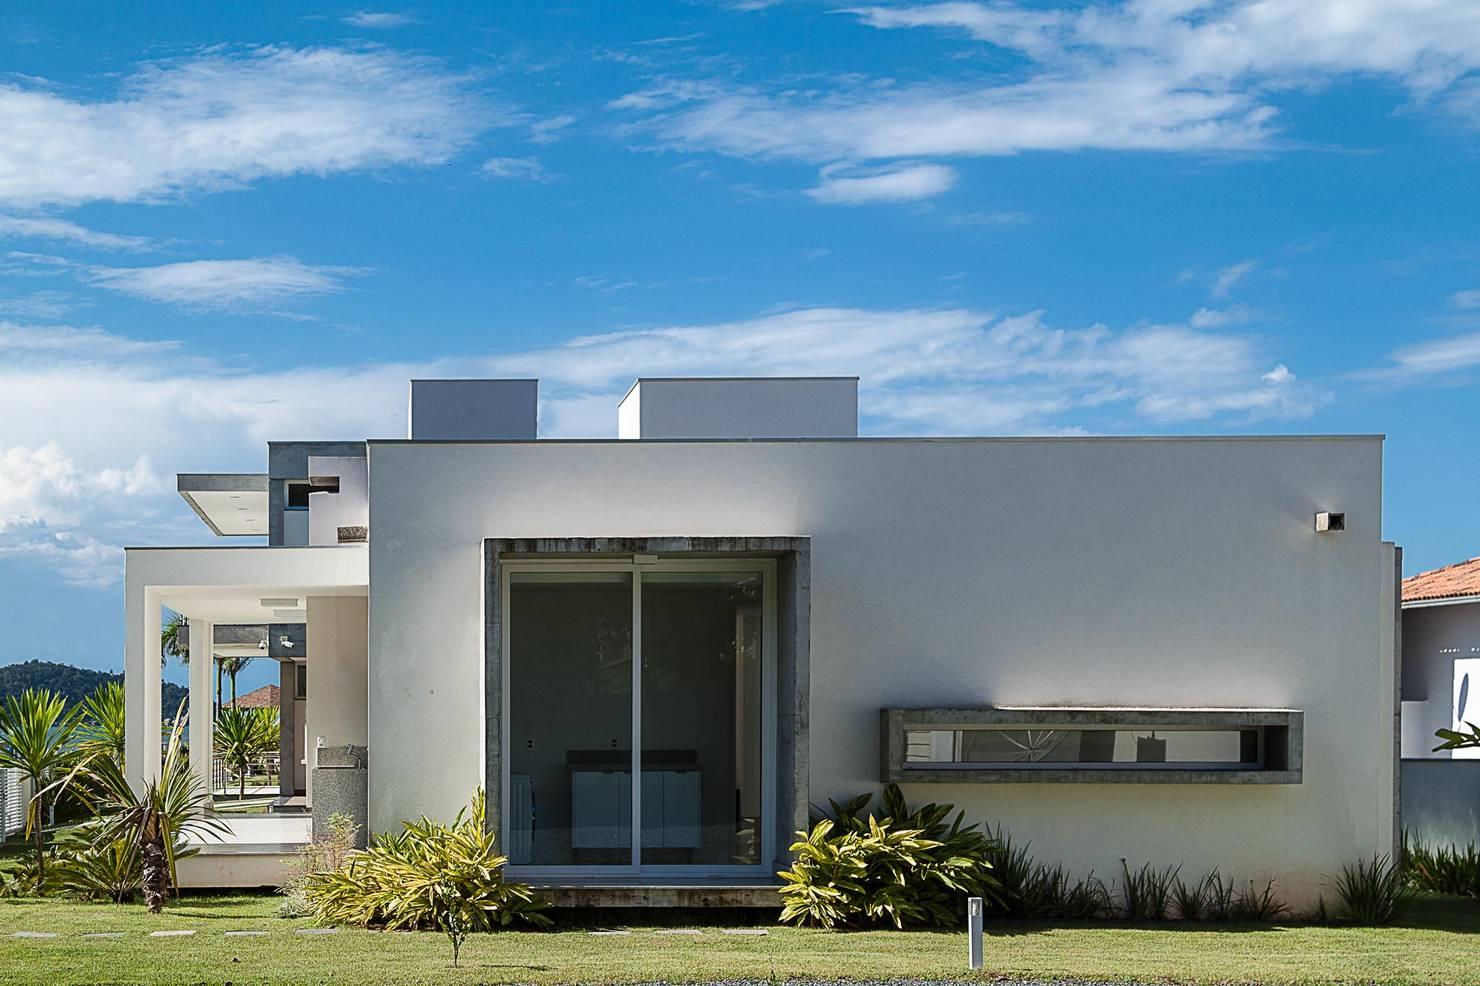 Casa Barata Em Santa Catarina Custou Apenas R$ 240 mil